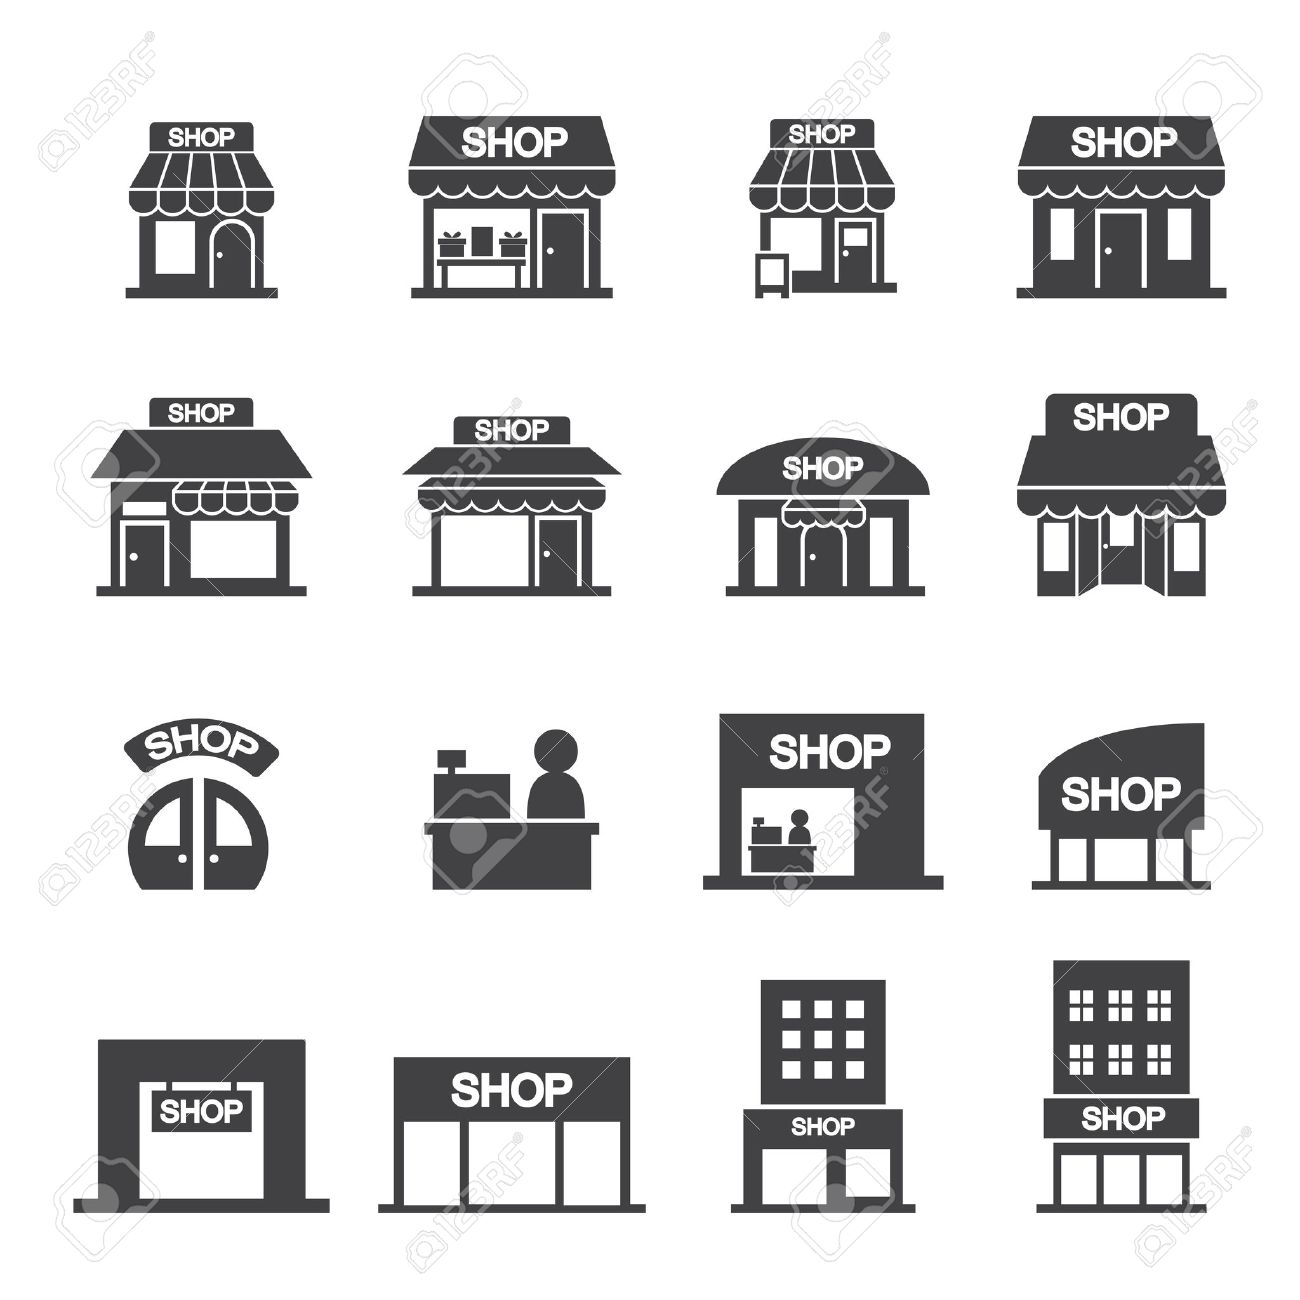 shop building icon set - 33447345